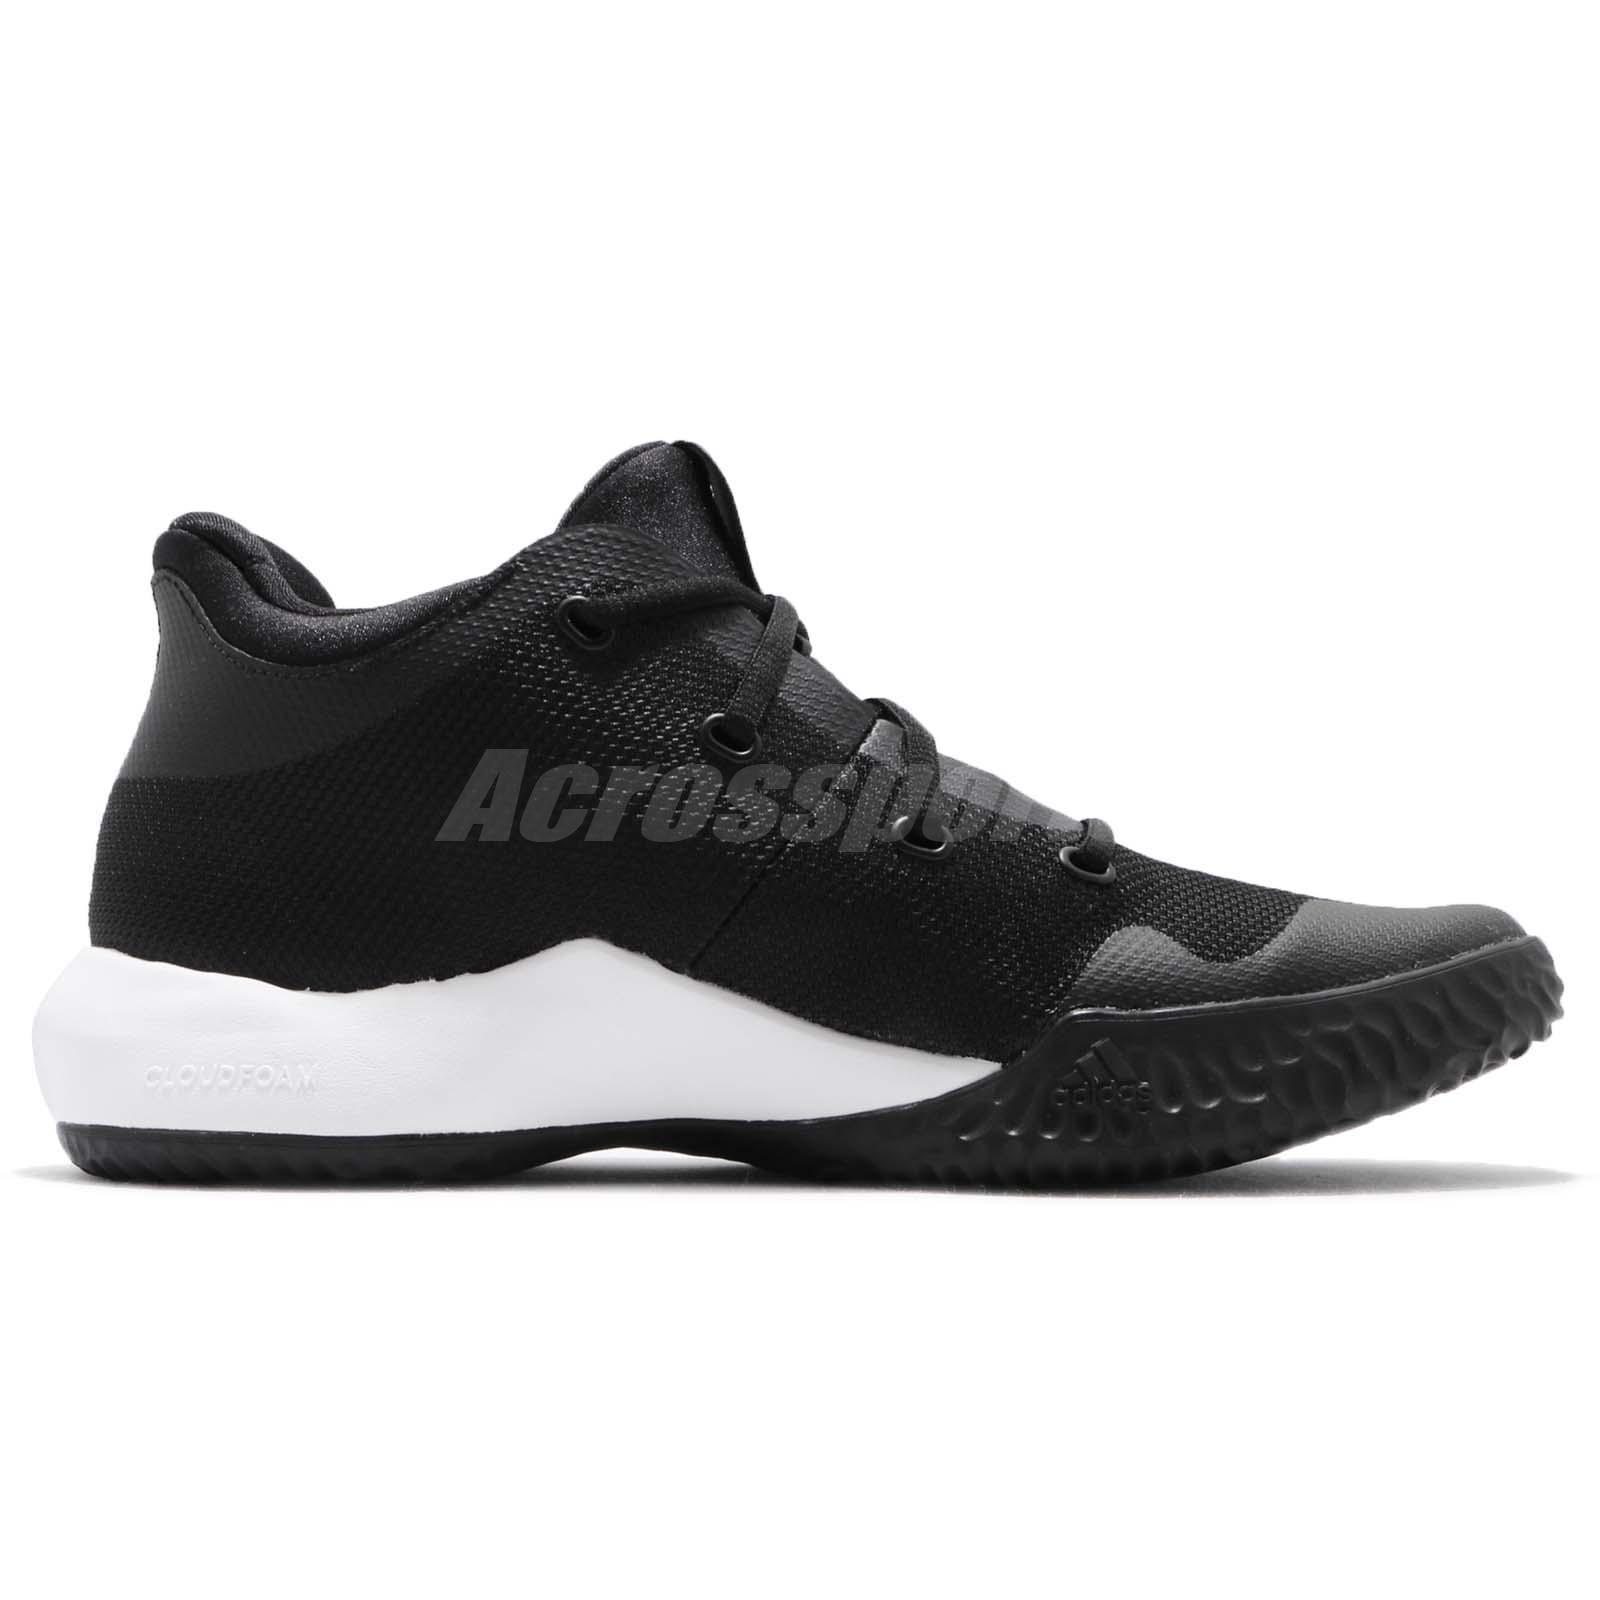 db6e2b950eb adidas Rise Up 2 II White Black Men Basketball Shoes Sneakers ...